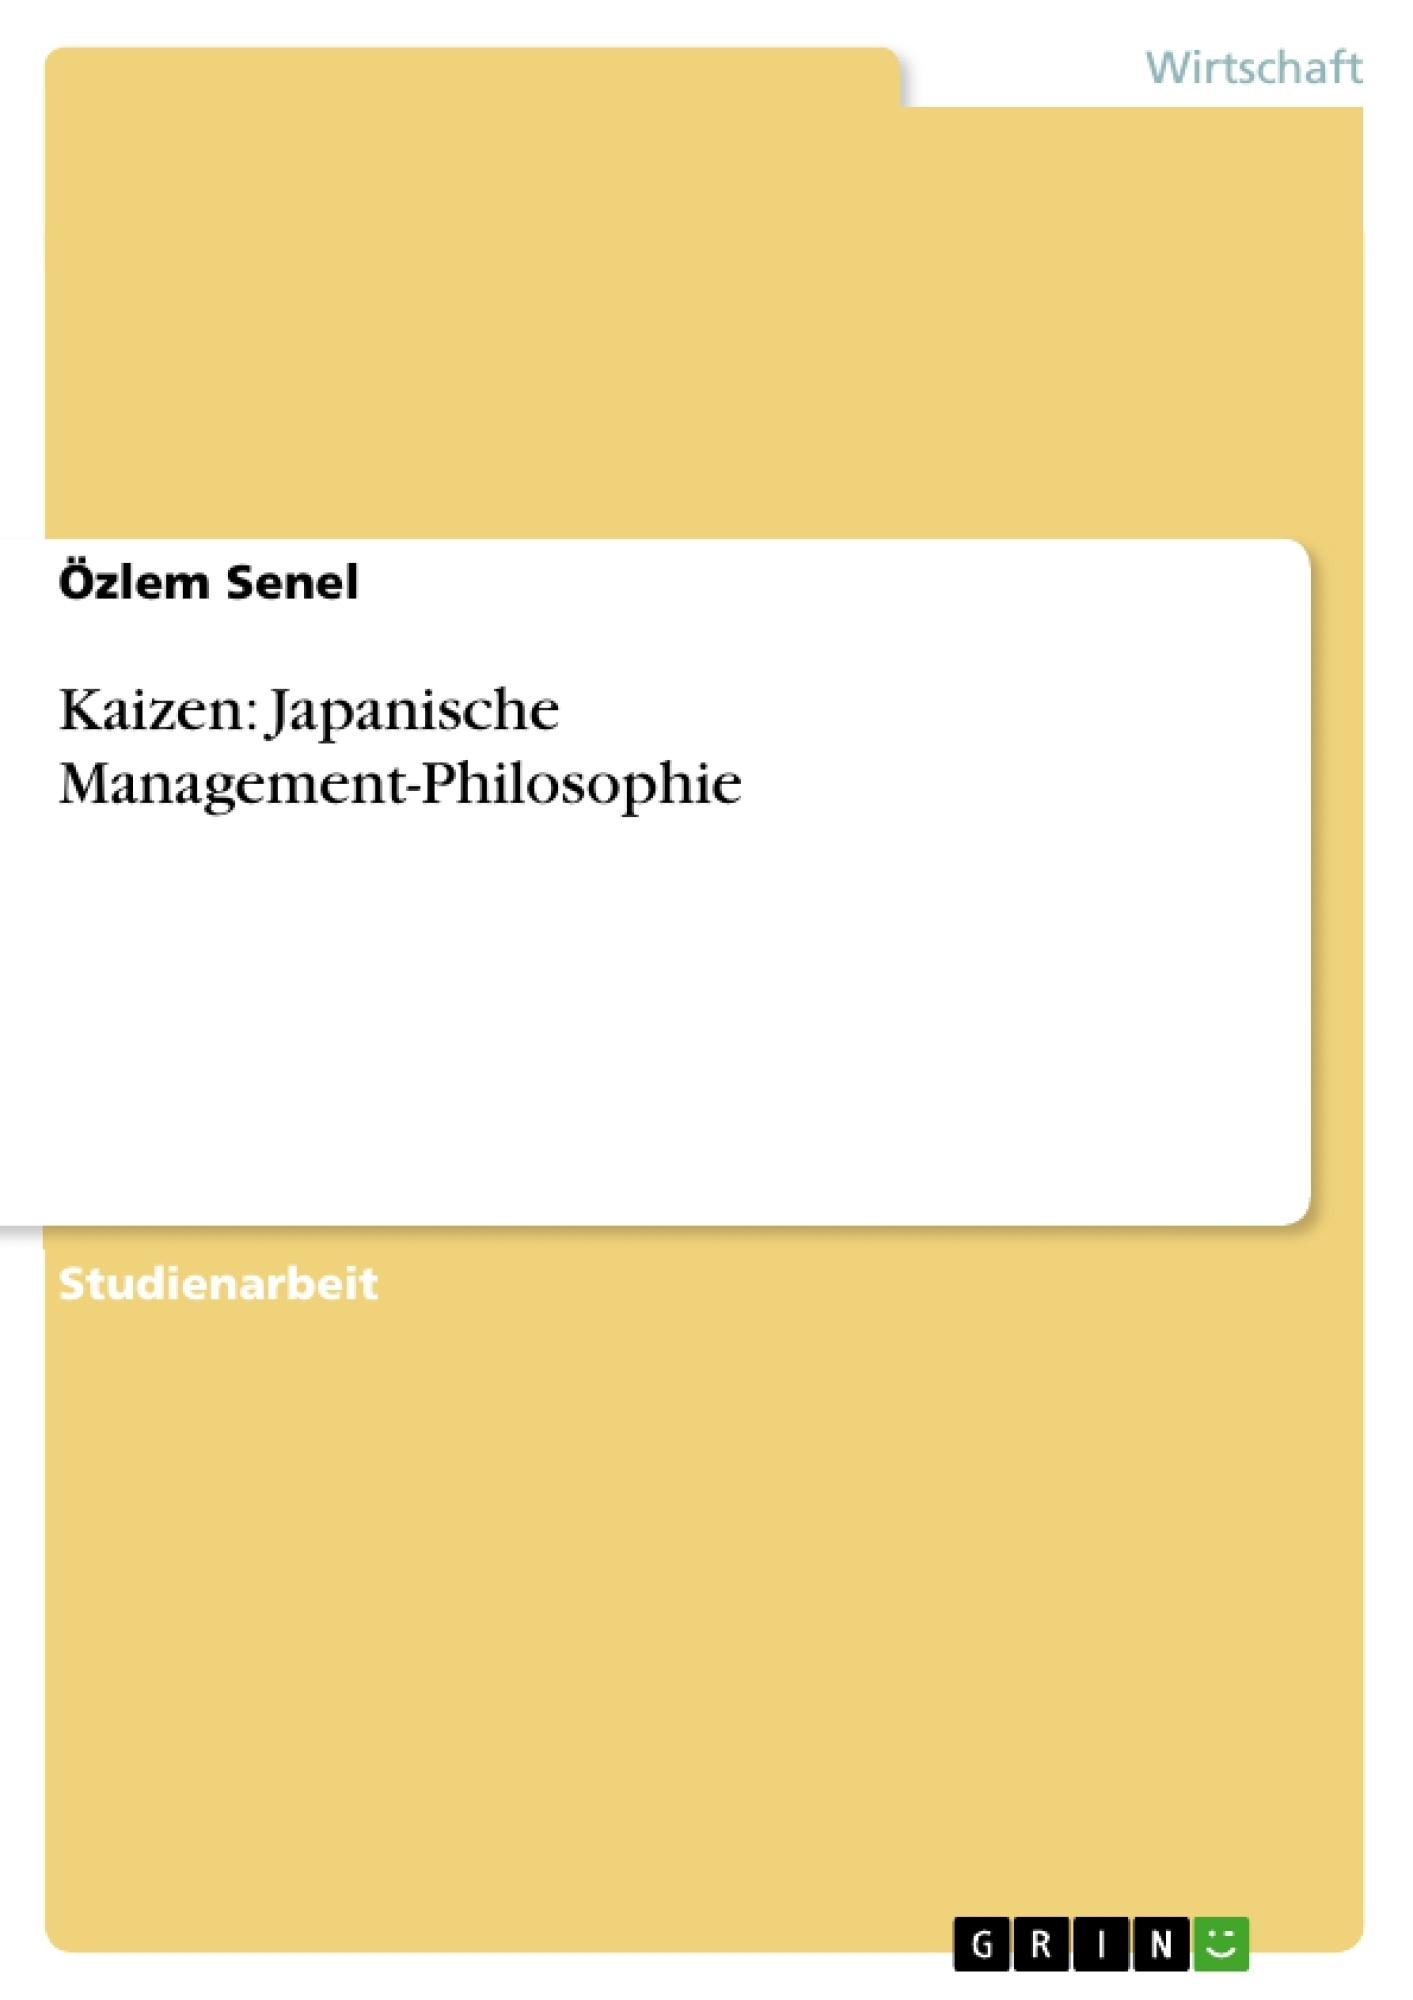 Titel: Kaizen: Japanische Management-Philosophie